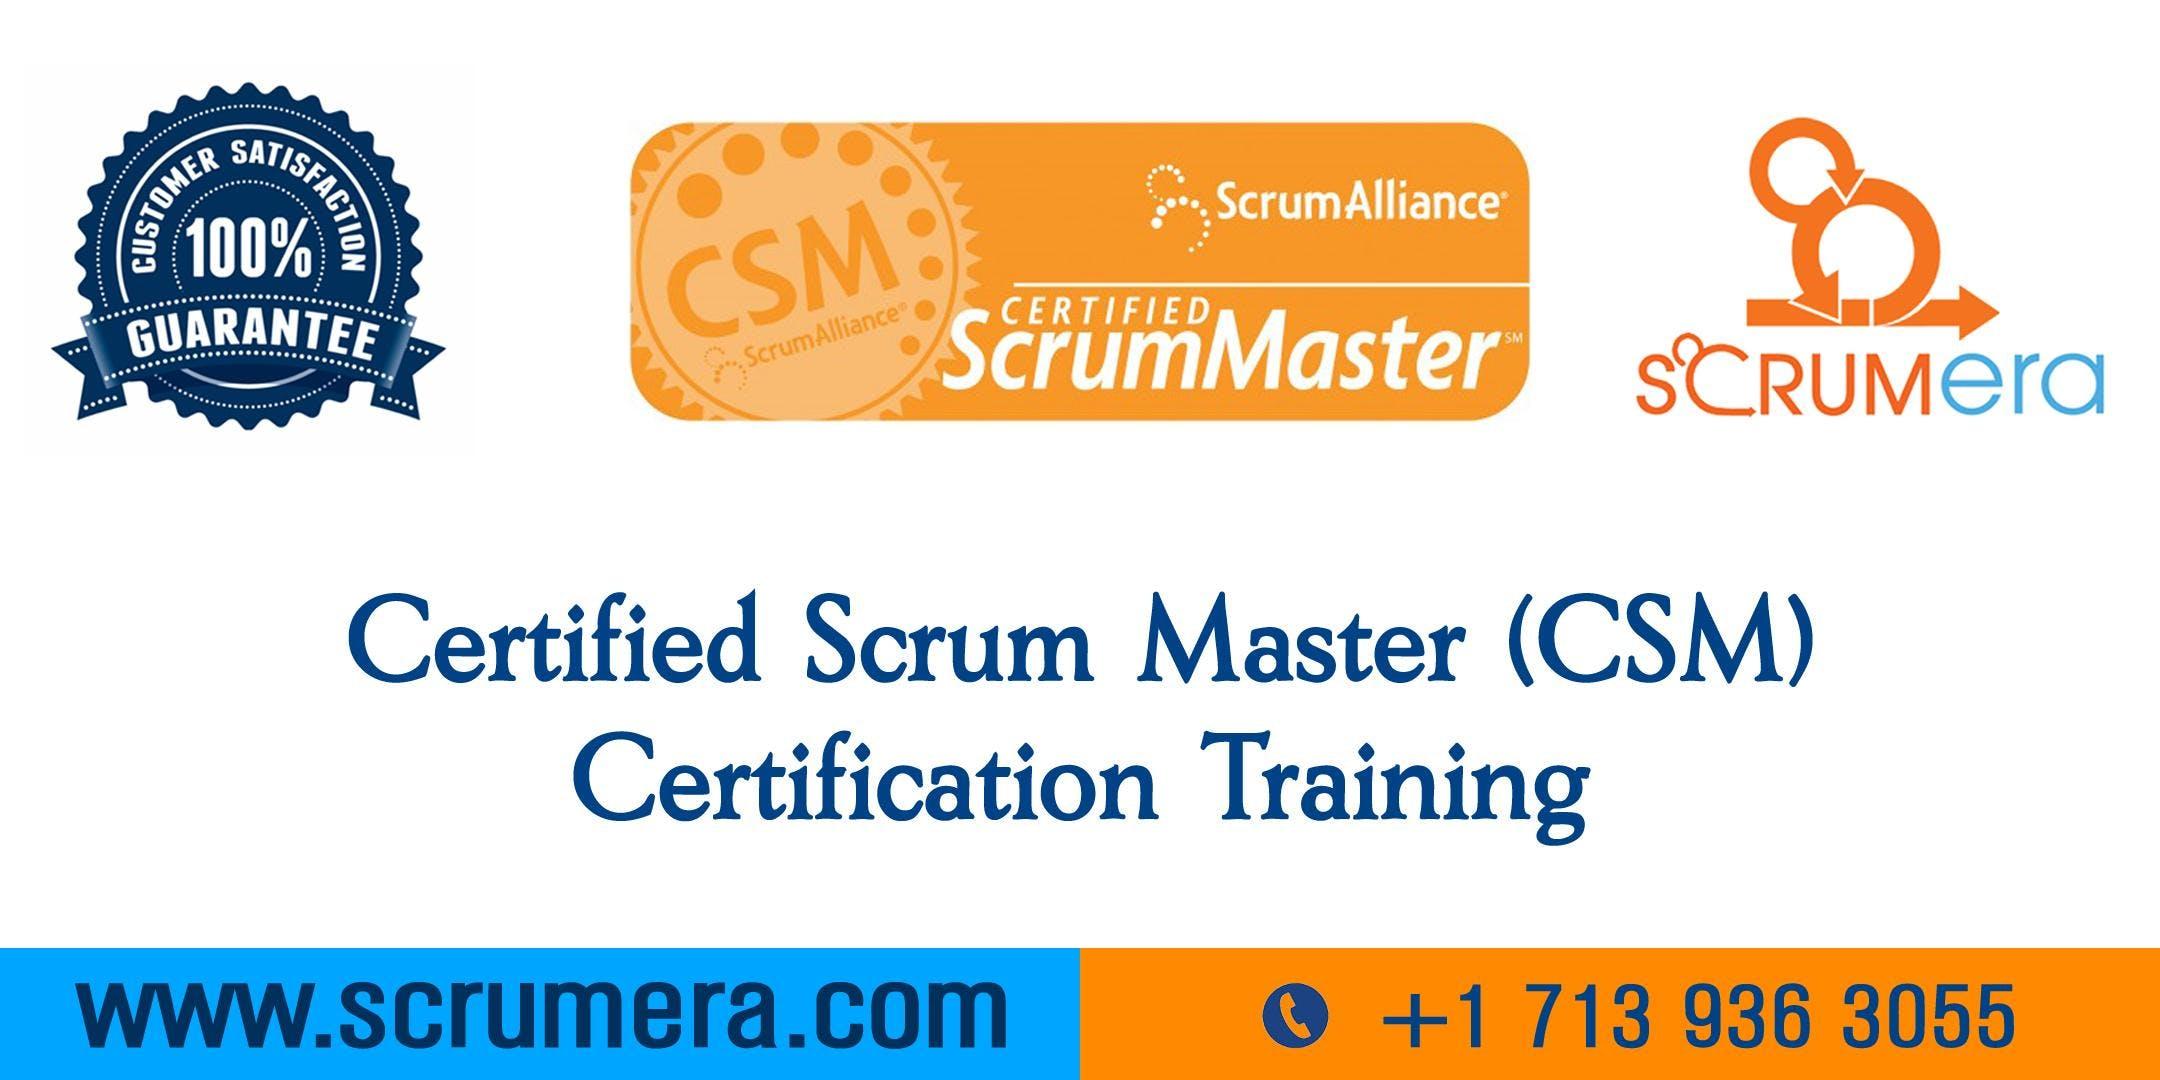 Scrum Master Certification | CSM Training | CSM Certification Workshop | Certified Scrum Master (CSM) Training in Newark, NJ | ScrumERA